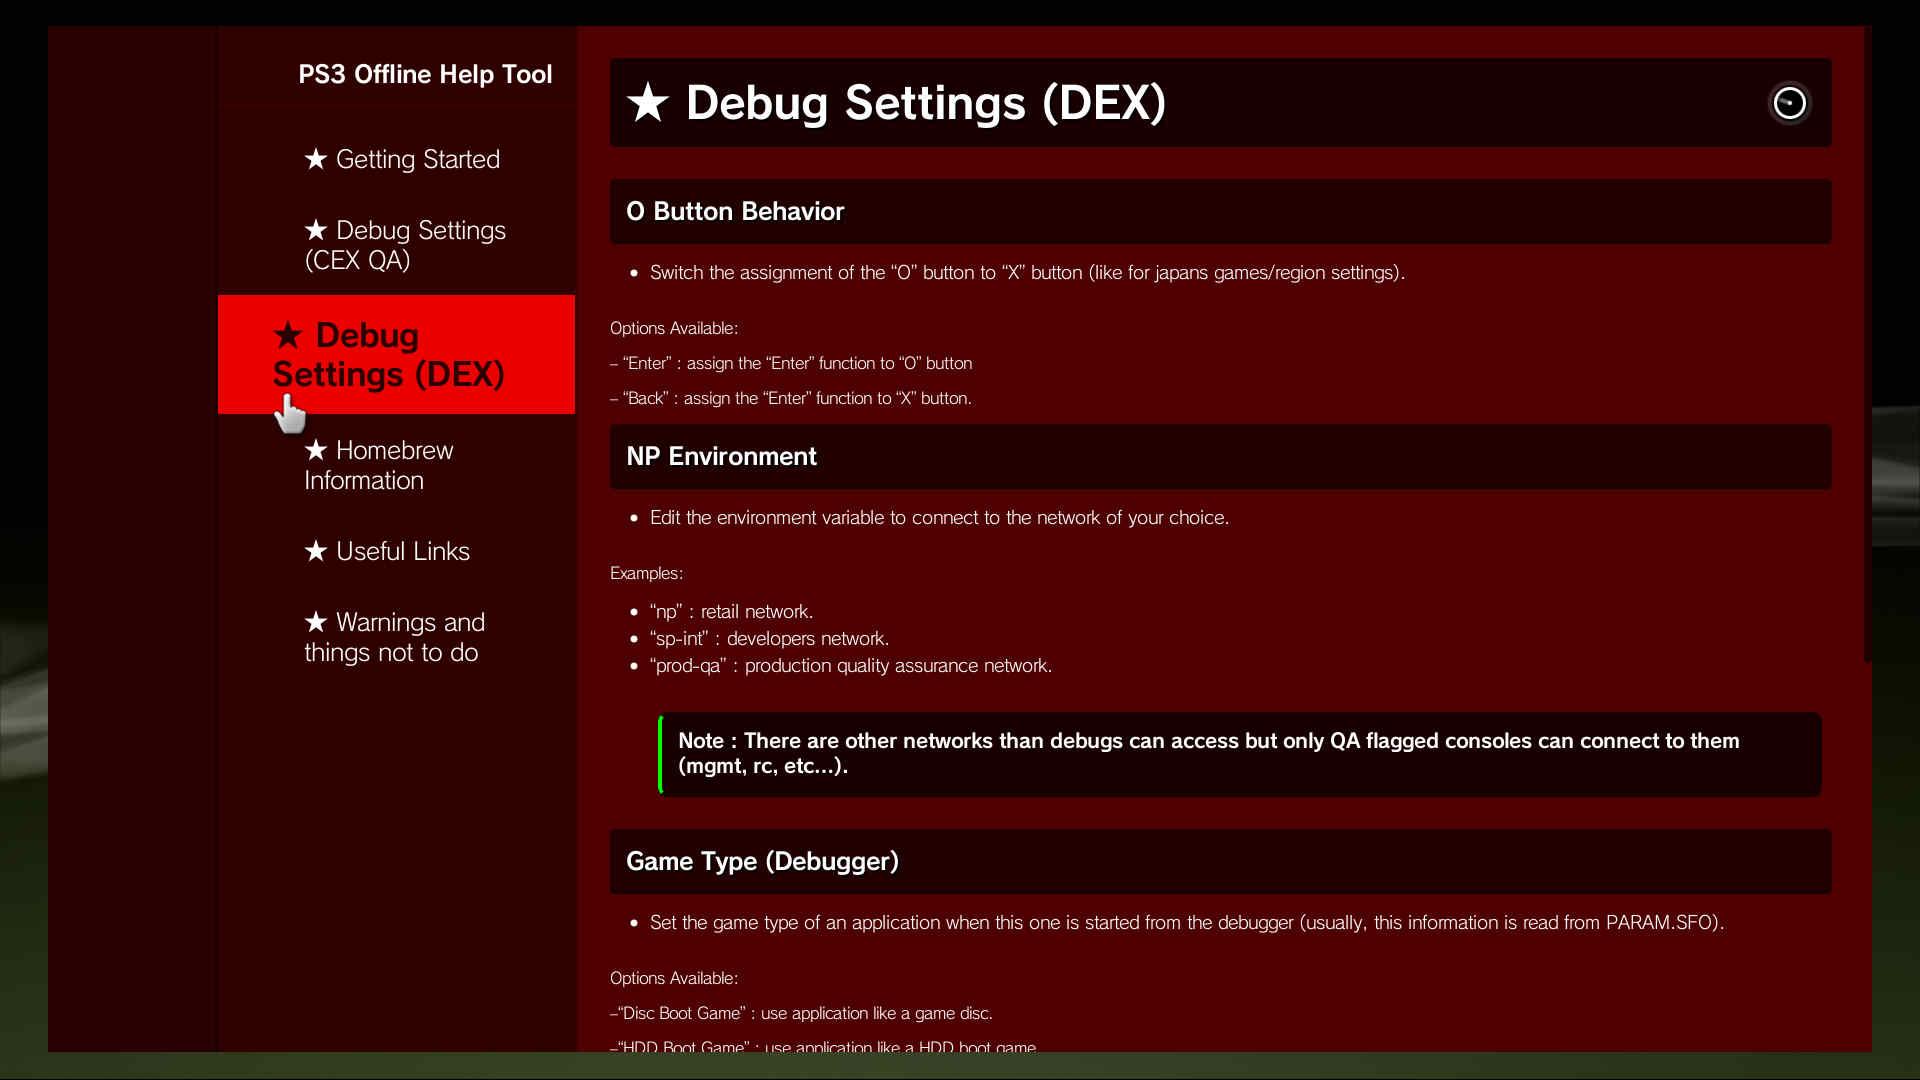 offline_help_tool_idea2.jpg